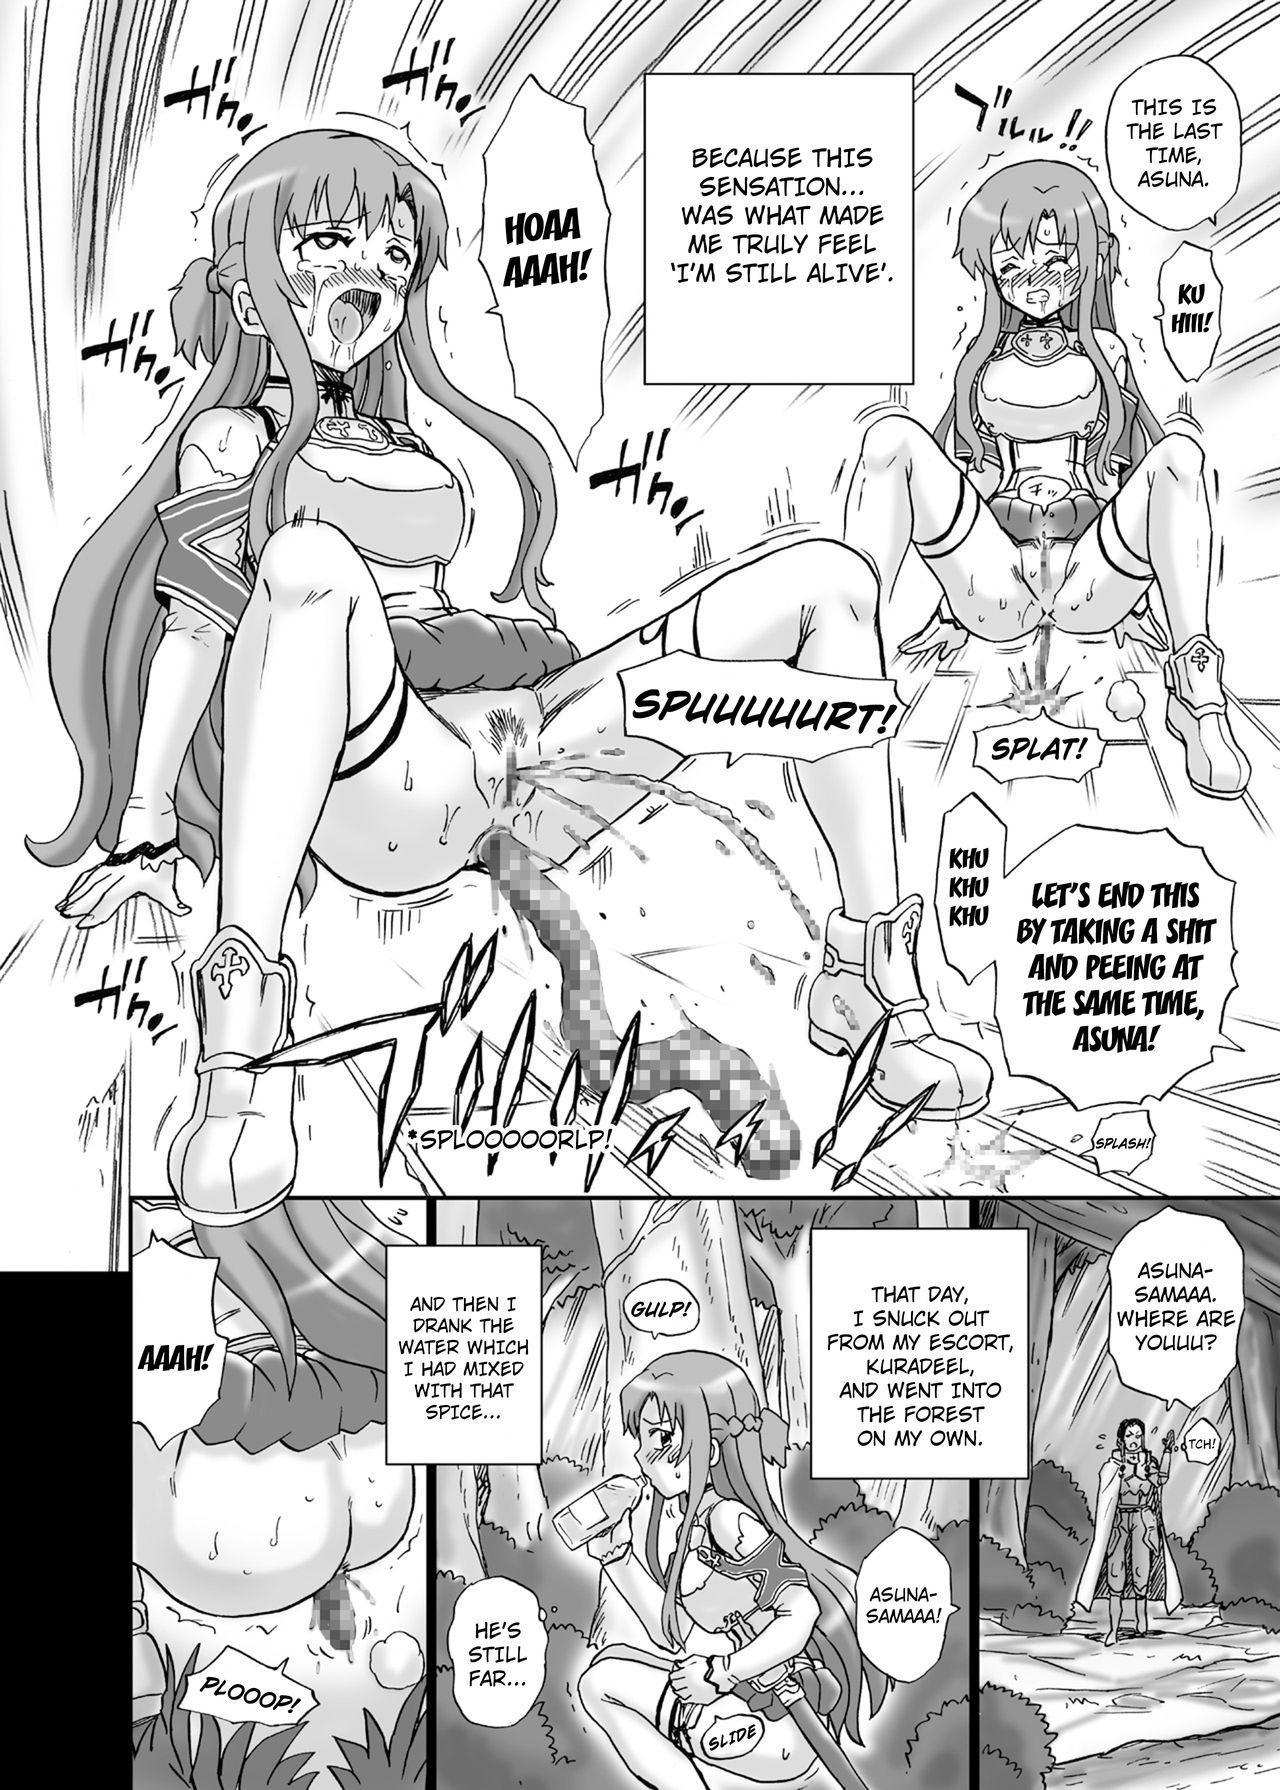 TAIL-MAN ASUNA BOOK 30